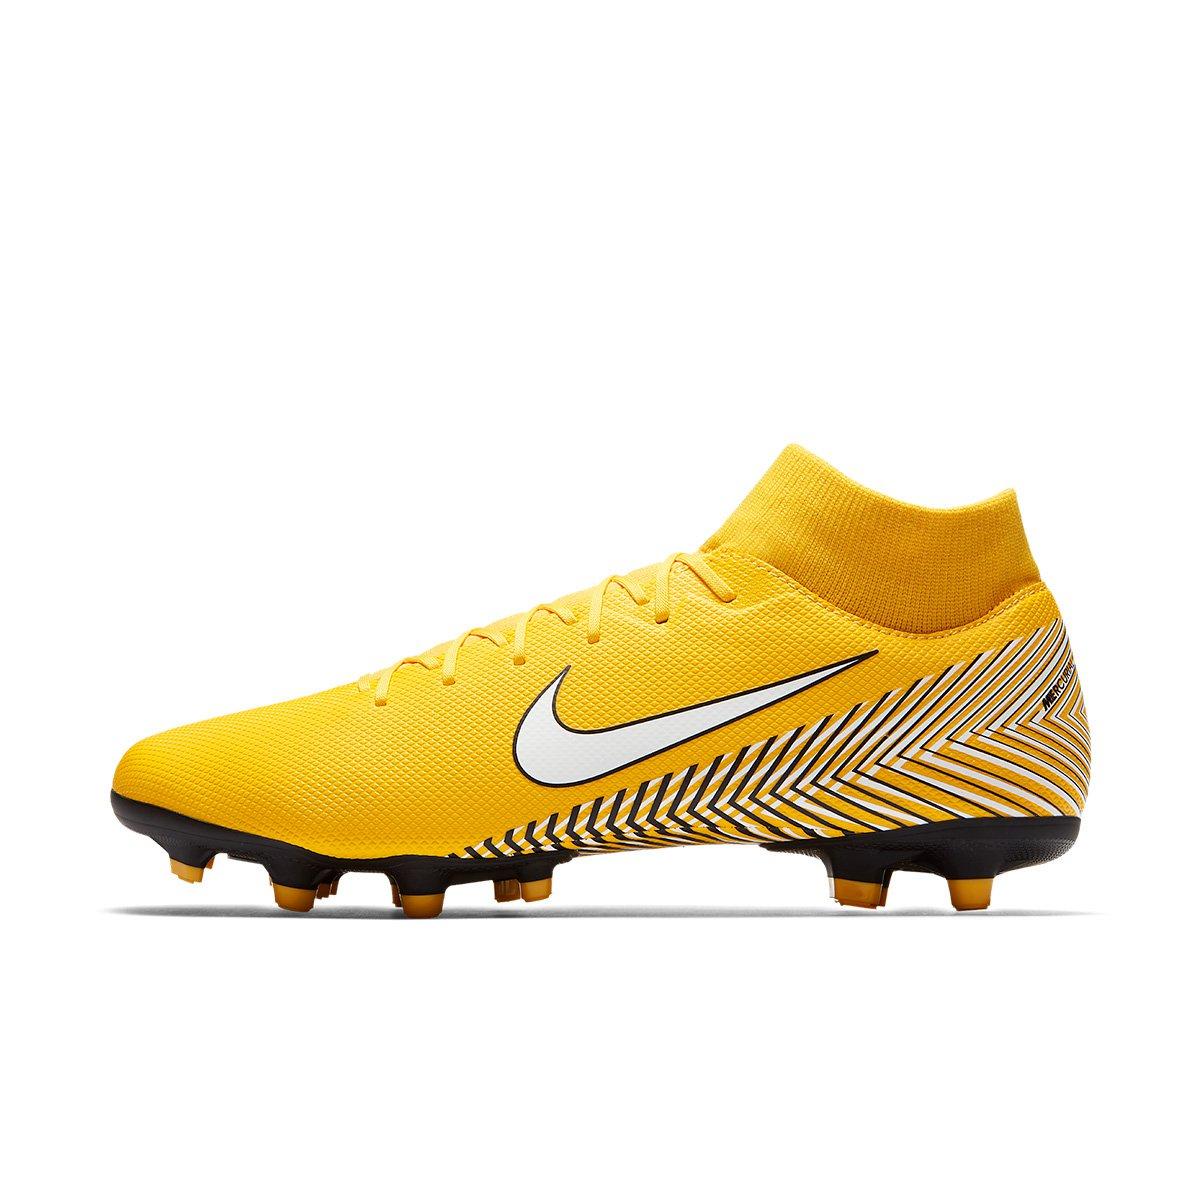 06ed7f5bea Chuteira Campo Nike Mercurial Superfly 6 Academy Neymar FG - Amarelo ...